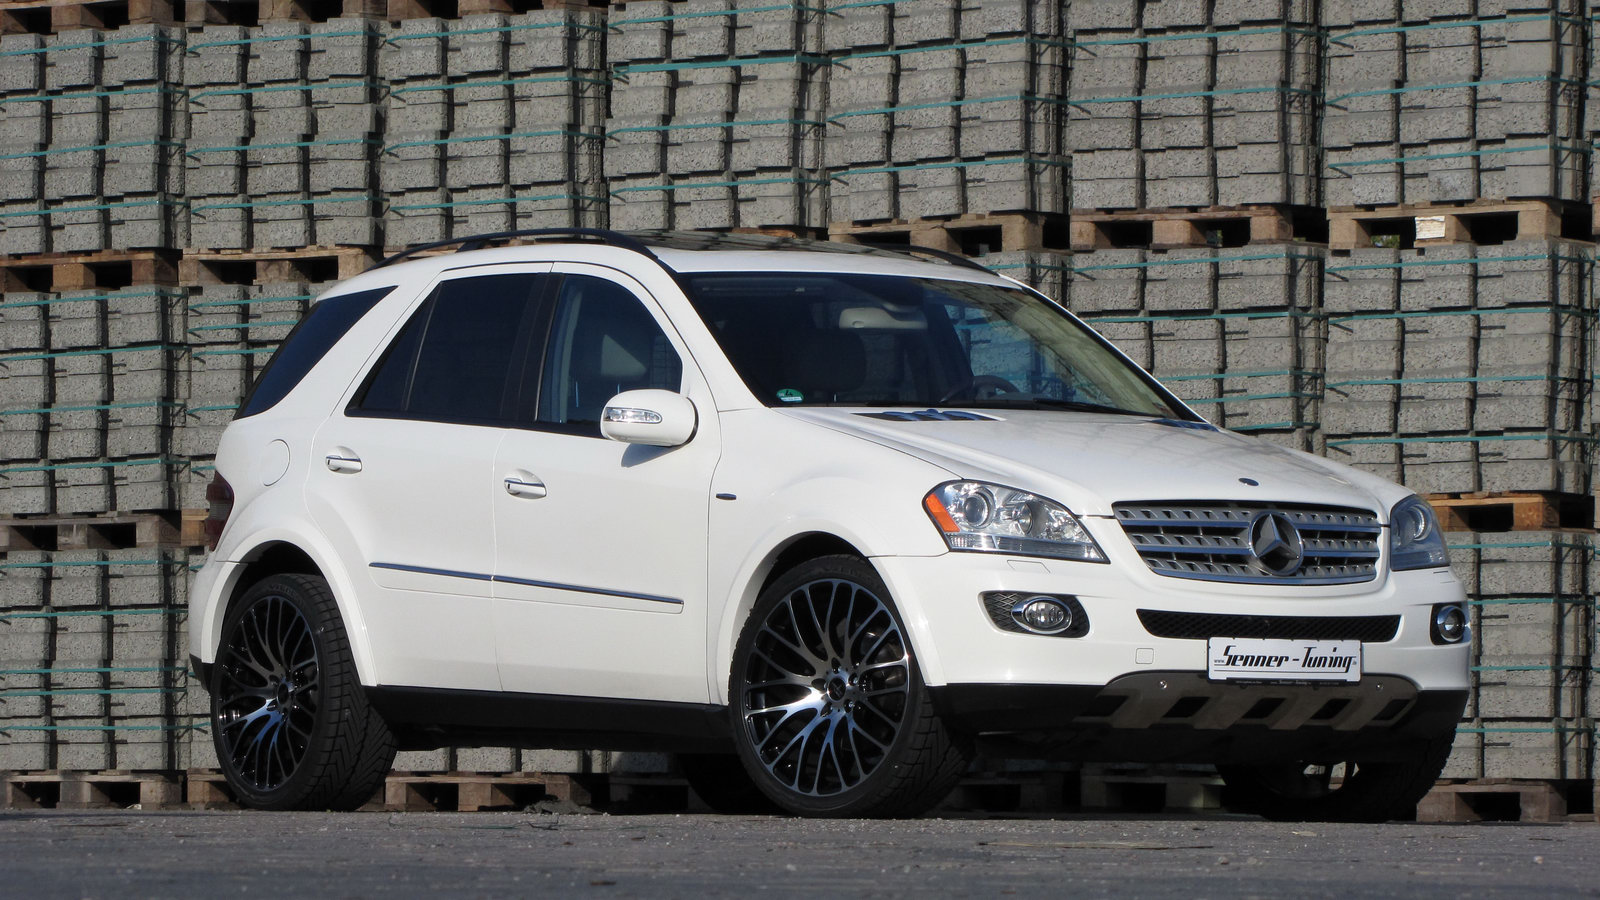 Senner tuning mercedes benz ml500 for Mercedes benz ml500